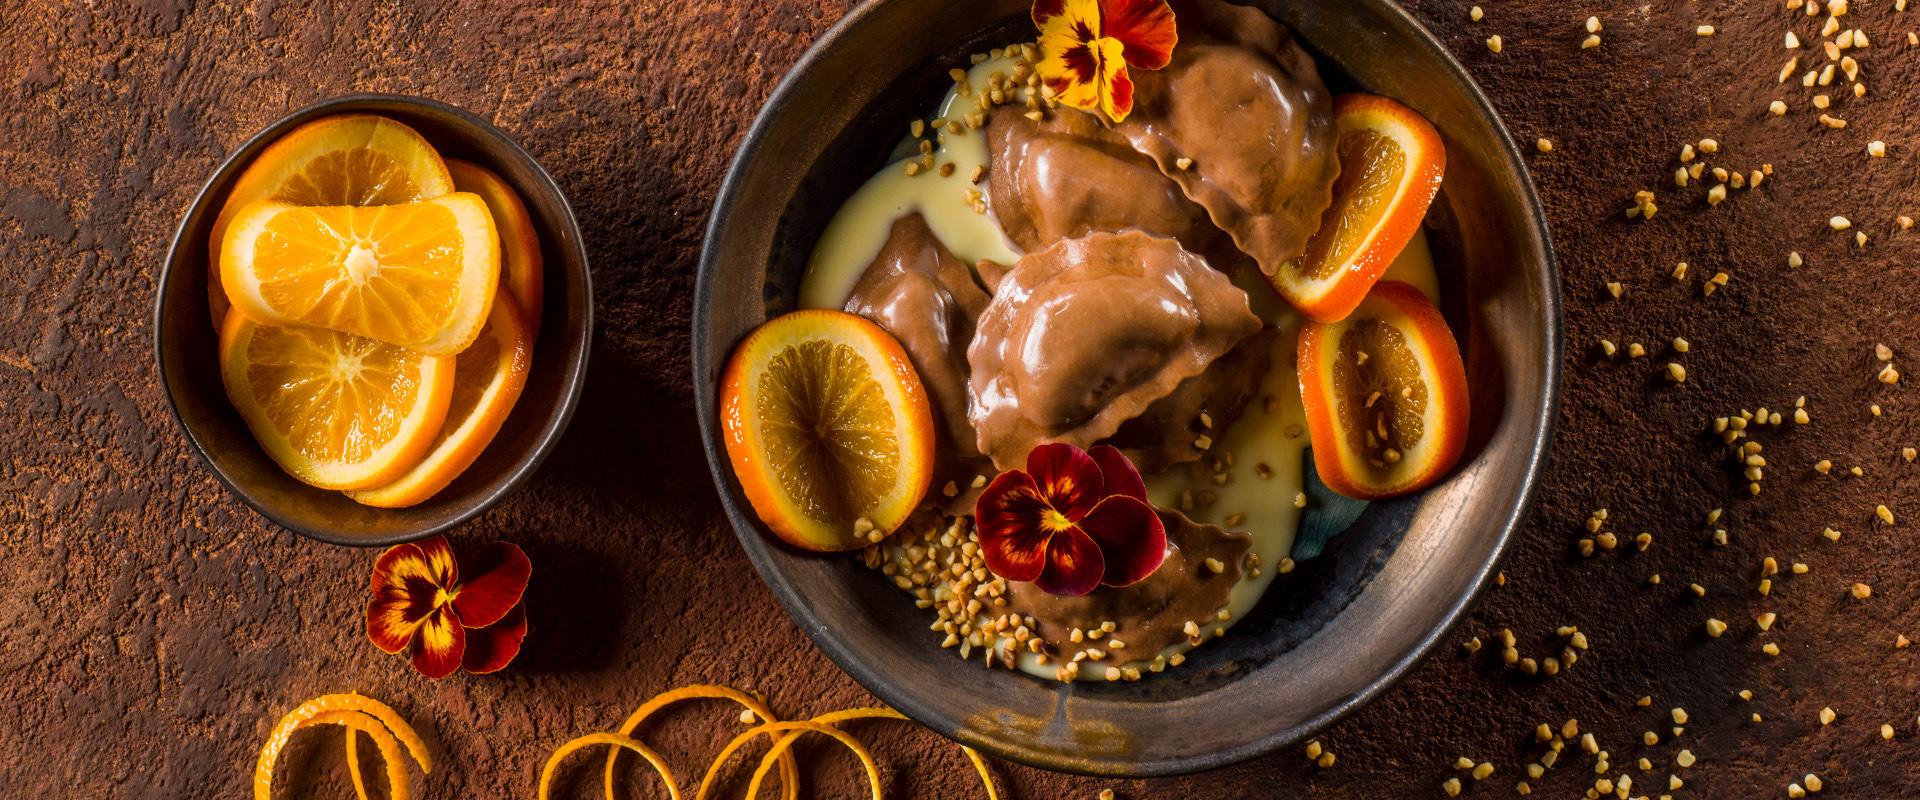 IT-ricette-ravioli-cioccolato-salsa-vaniglia-arance-D.jpg